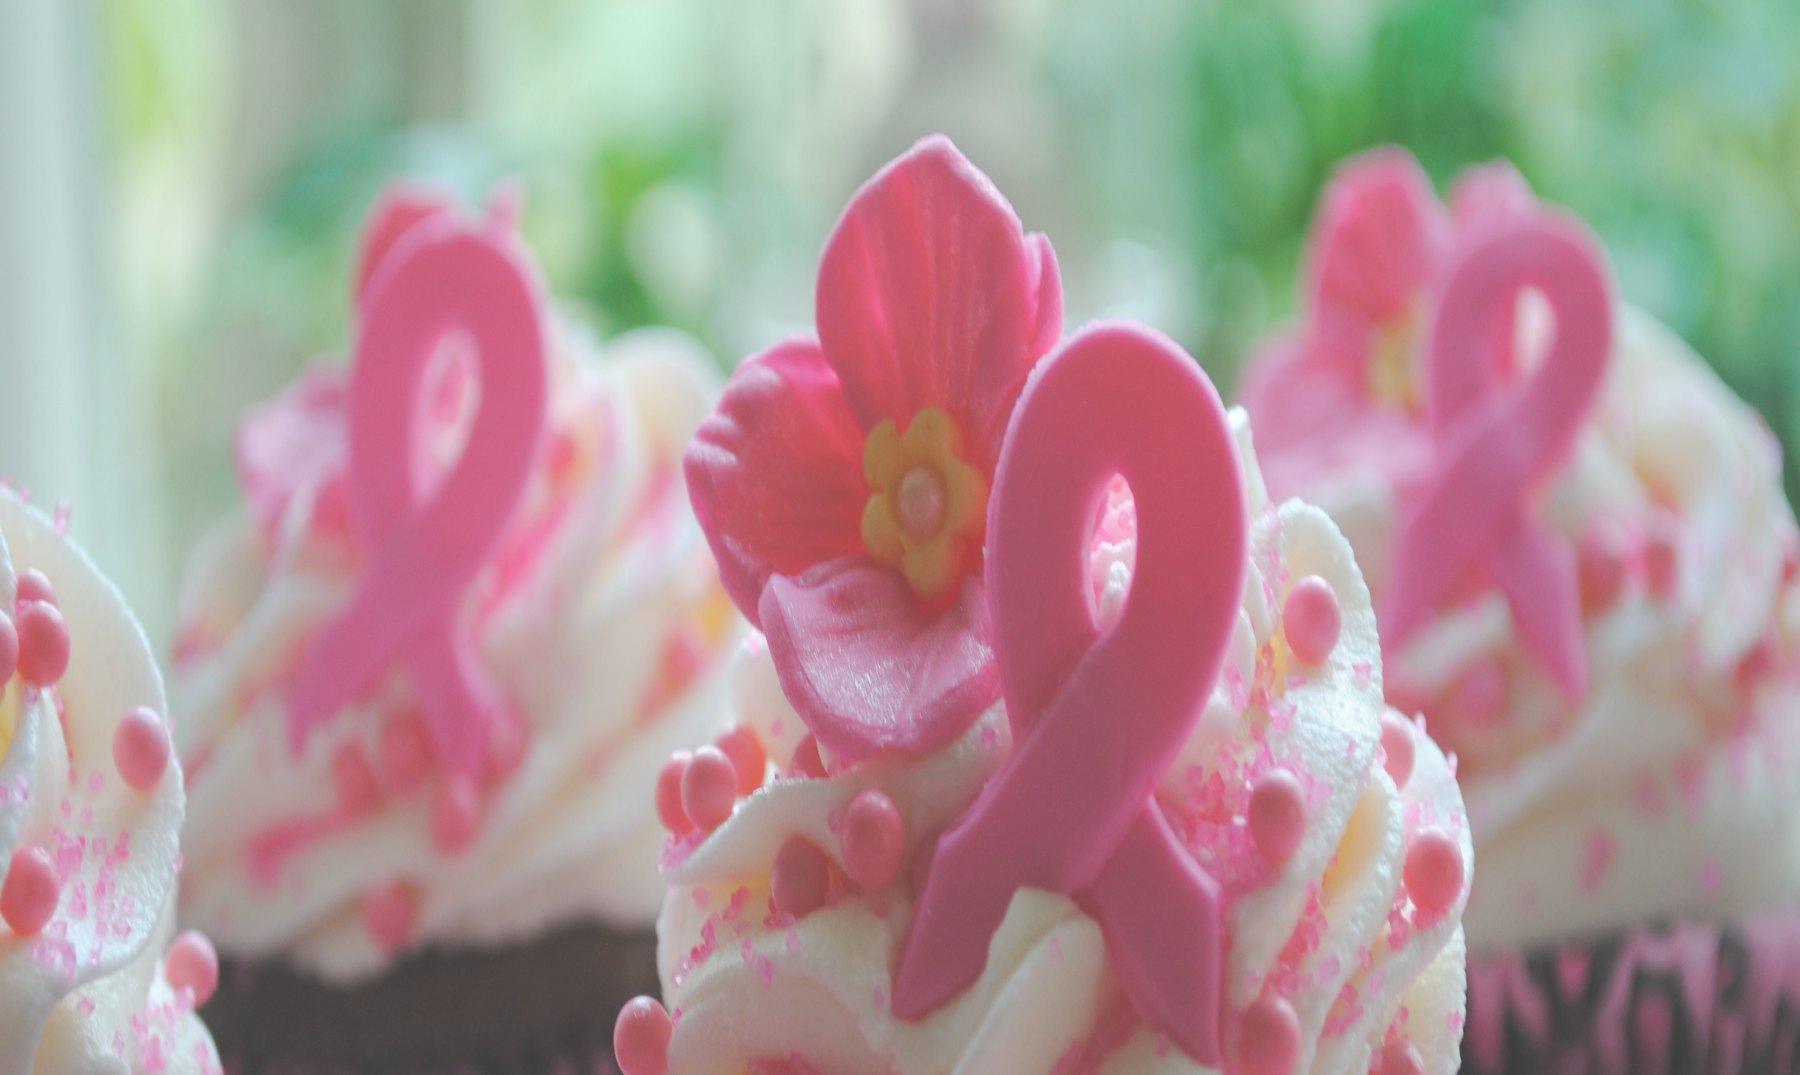 Mujeres invidentes para detectar tumores de mama